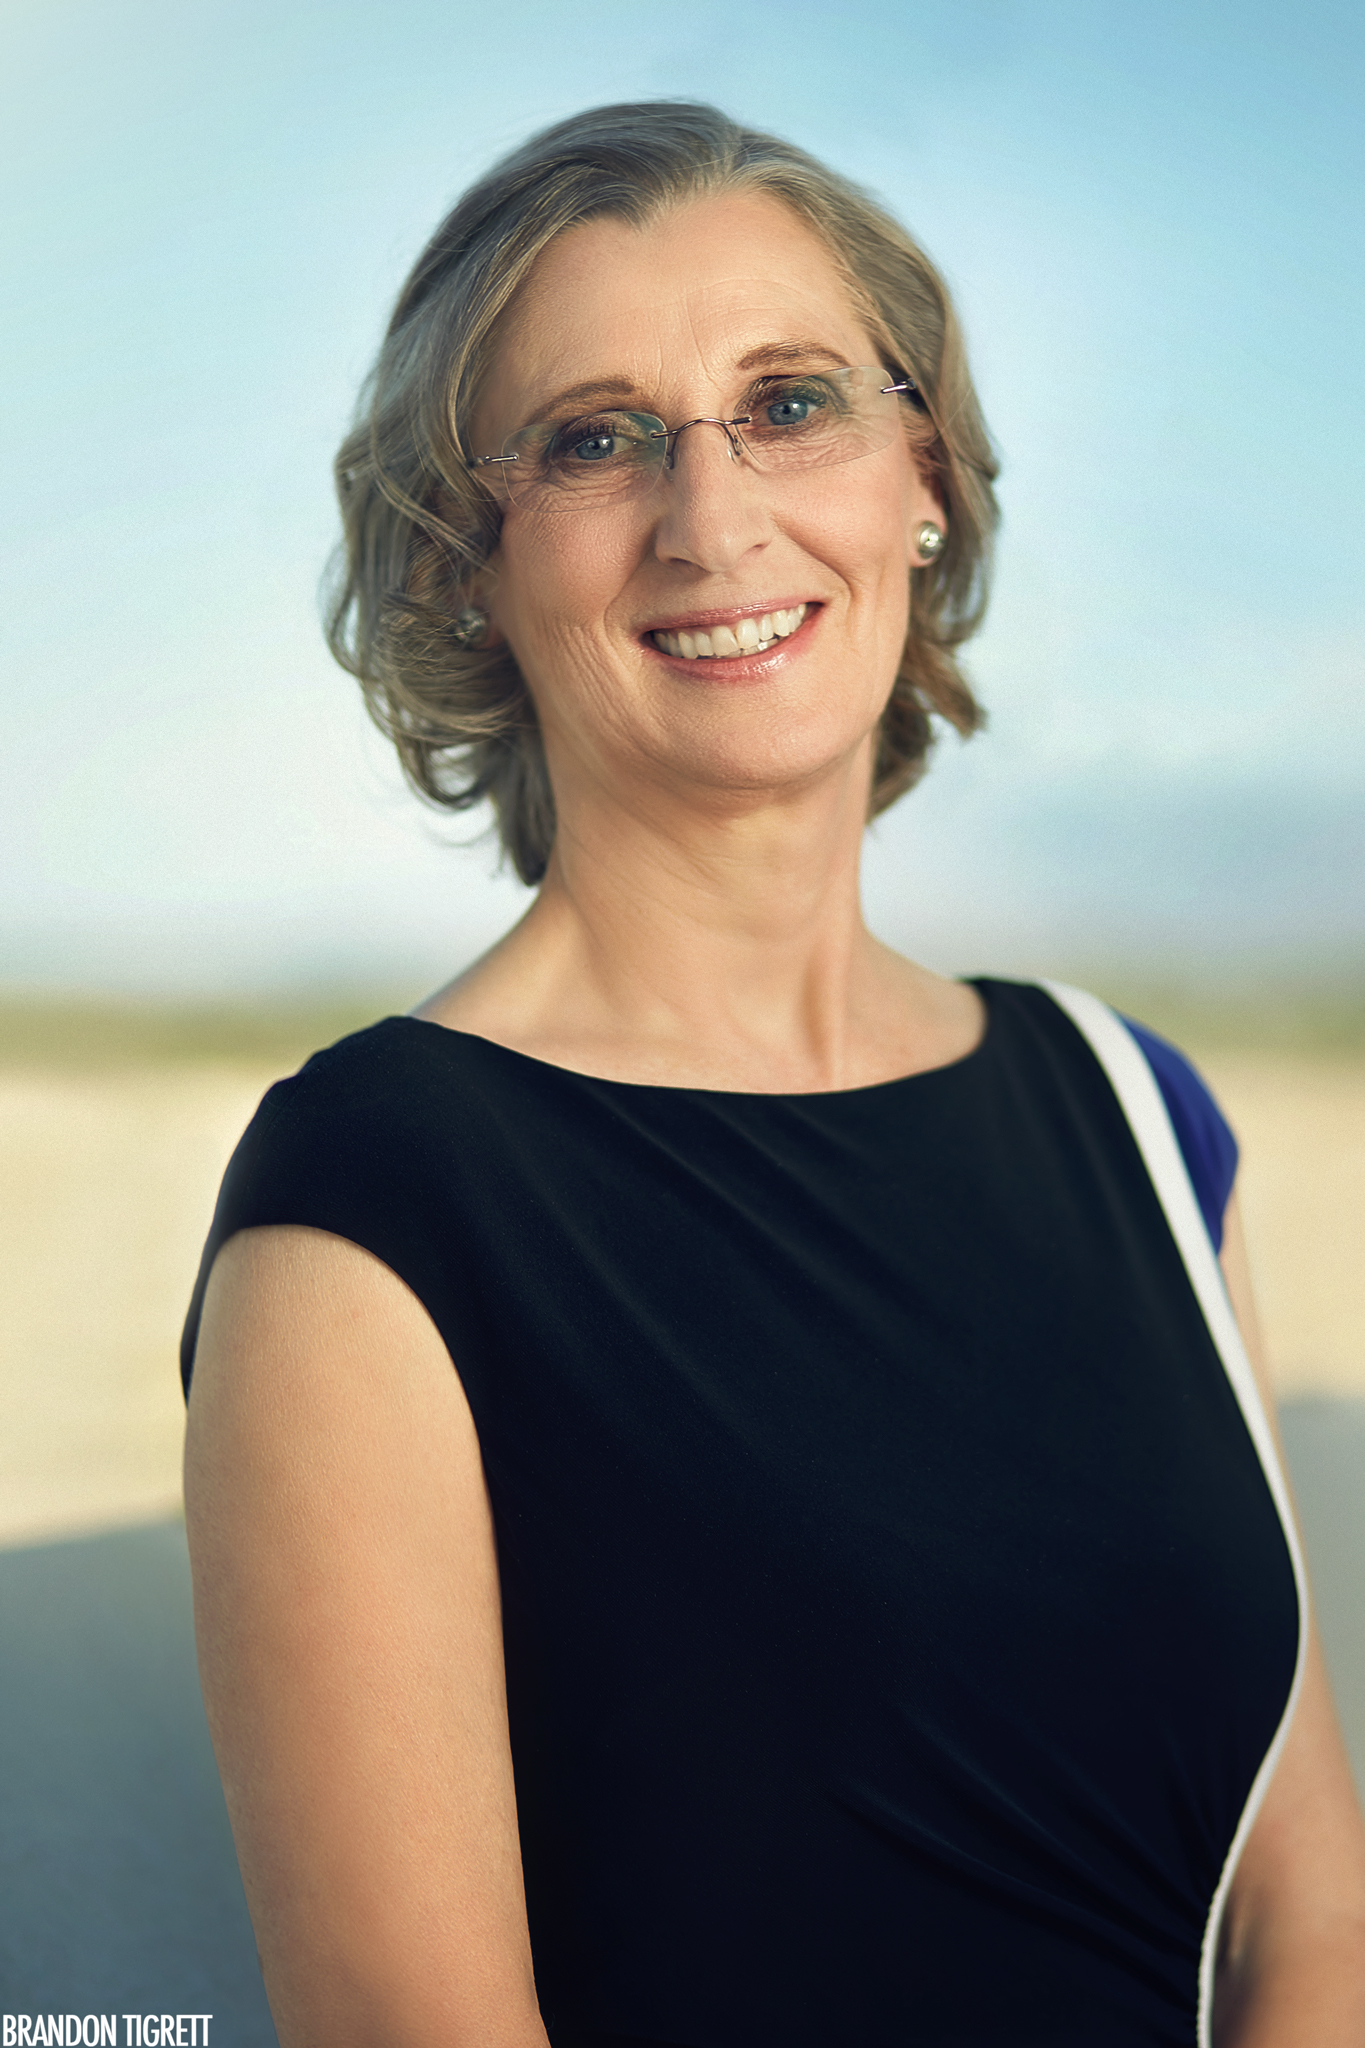 Cancer Treatment Center Of America - Jill Fargo Portrait